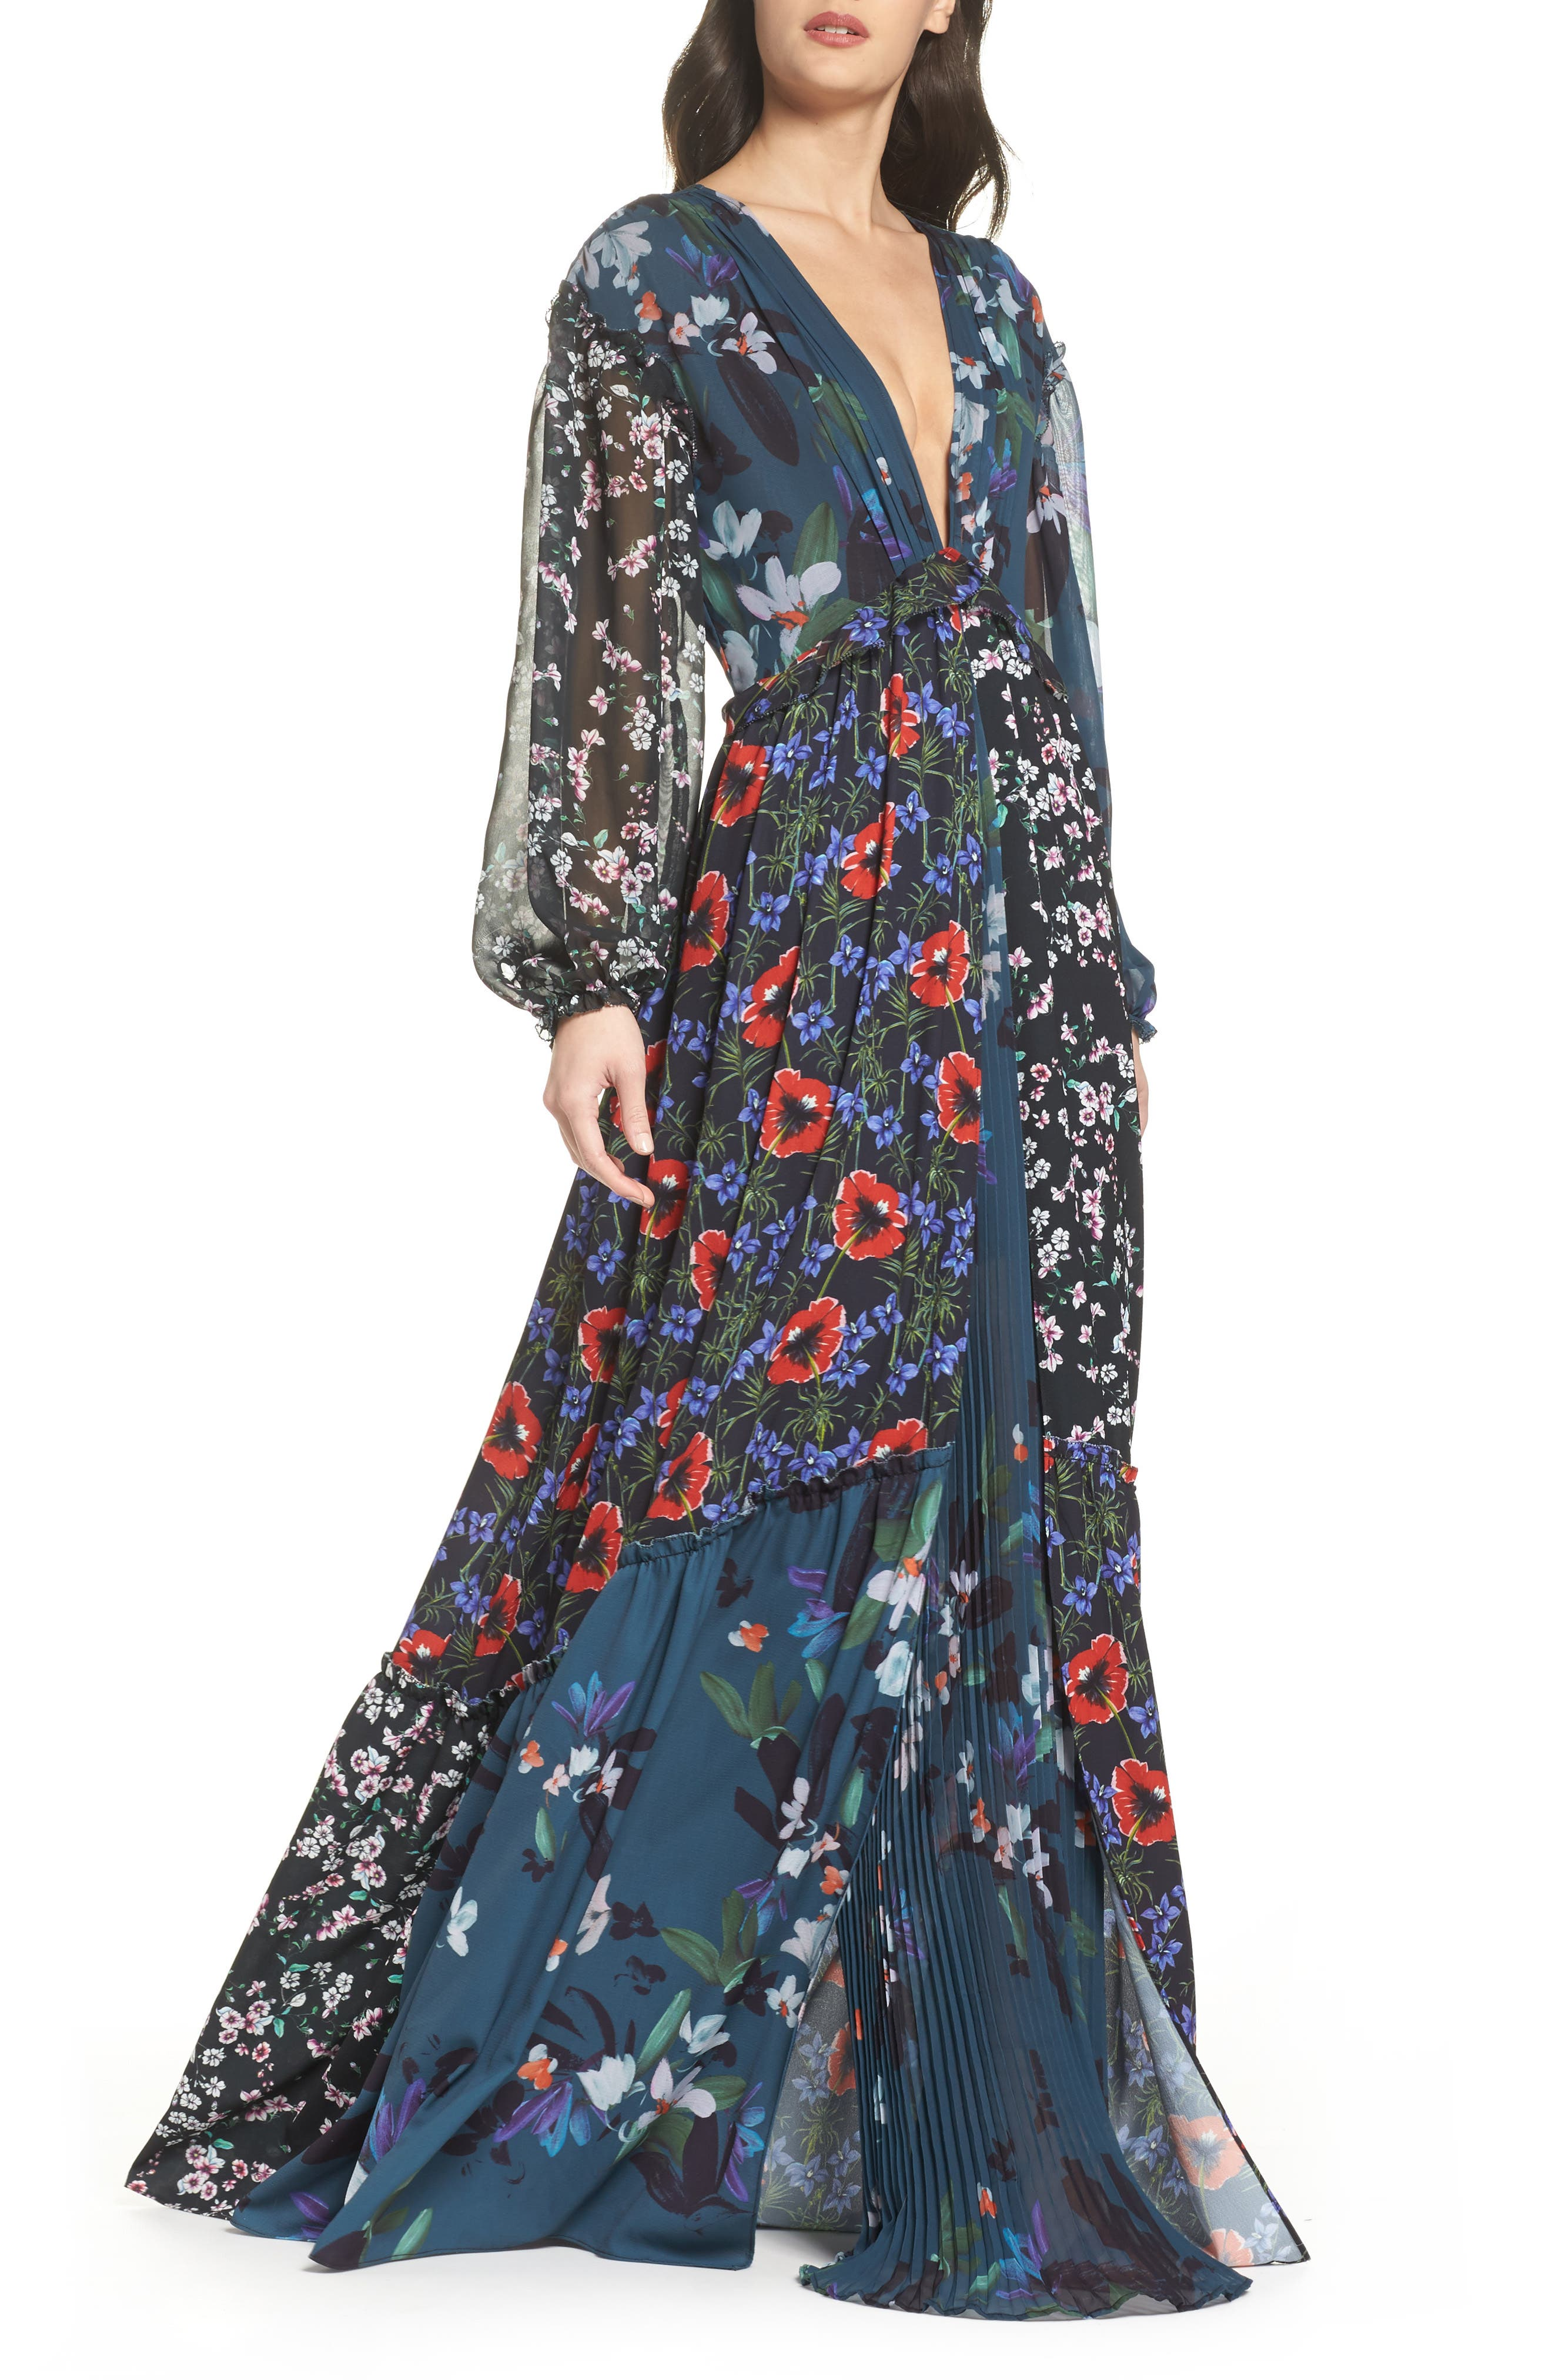 Celia Mix Floral Maxi Dress,                         Main,                         color, 451